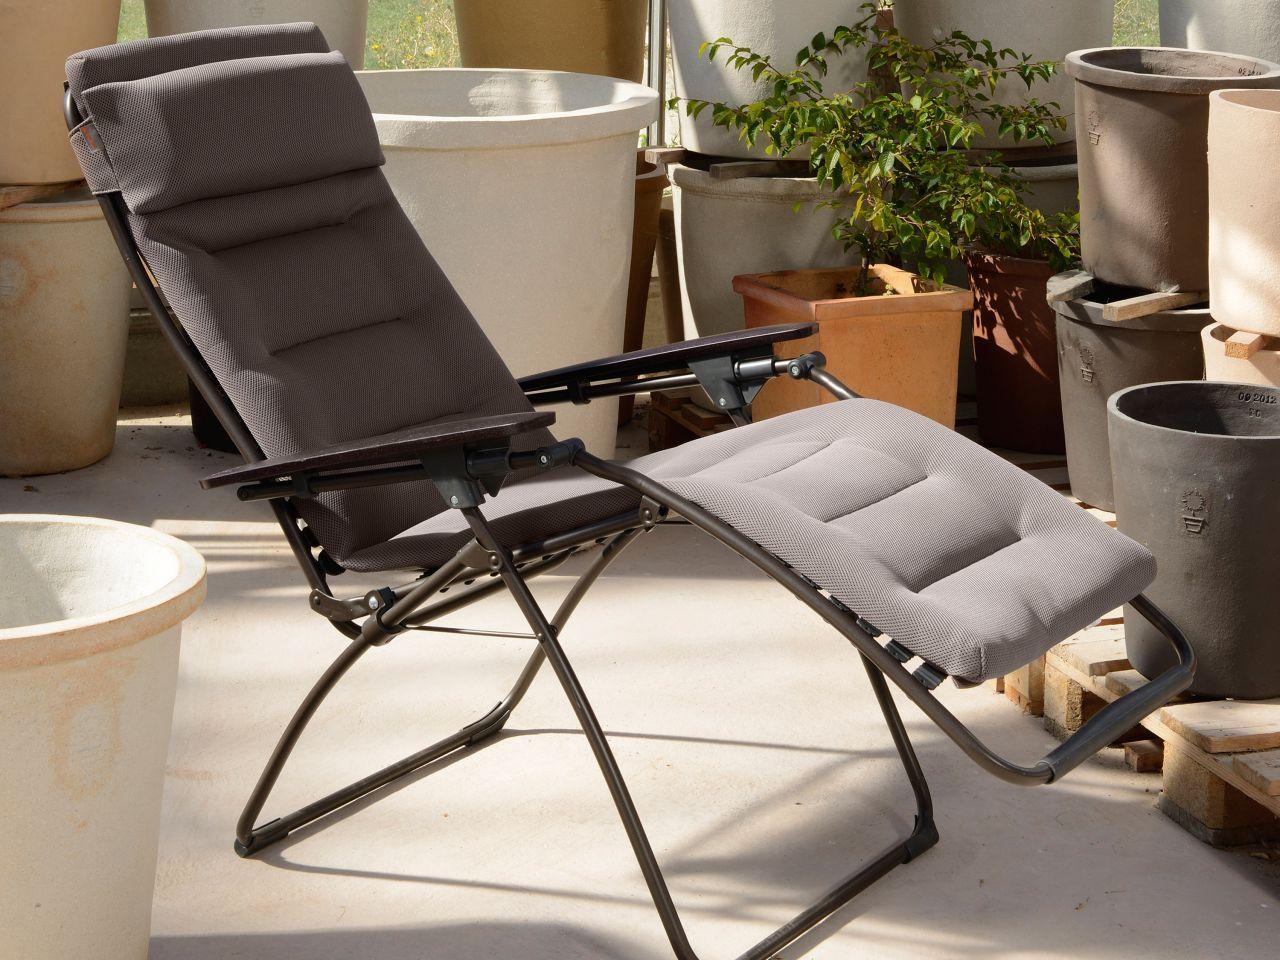 Relaxliege Futura Air Comfort taupe Ambientebild